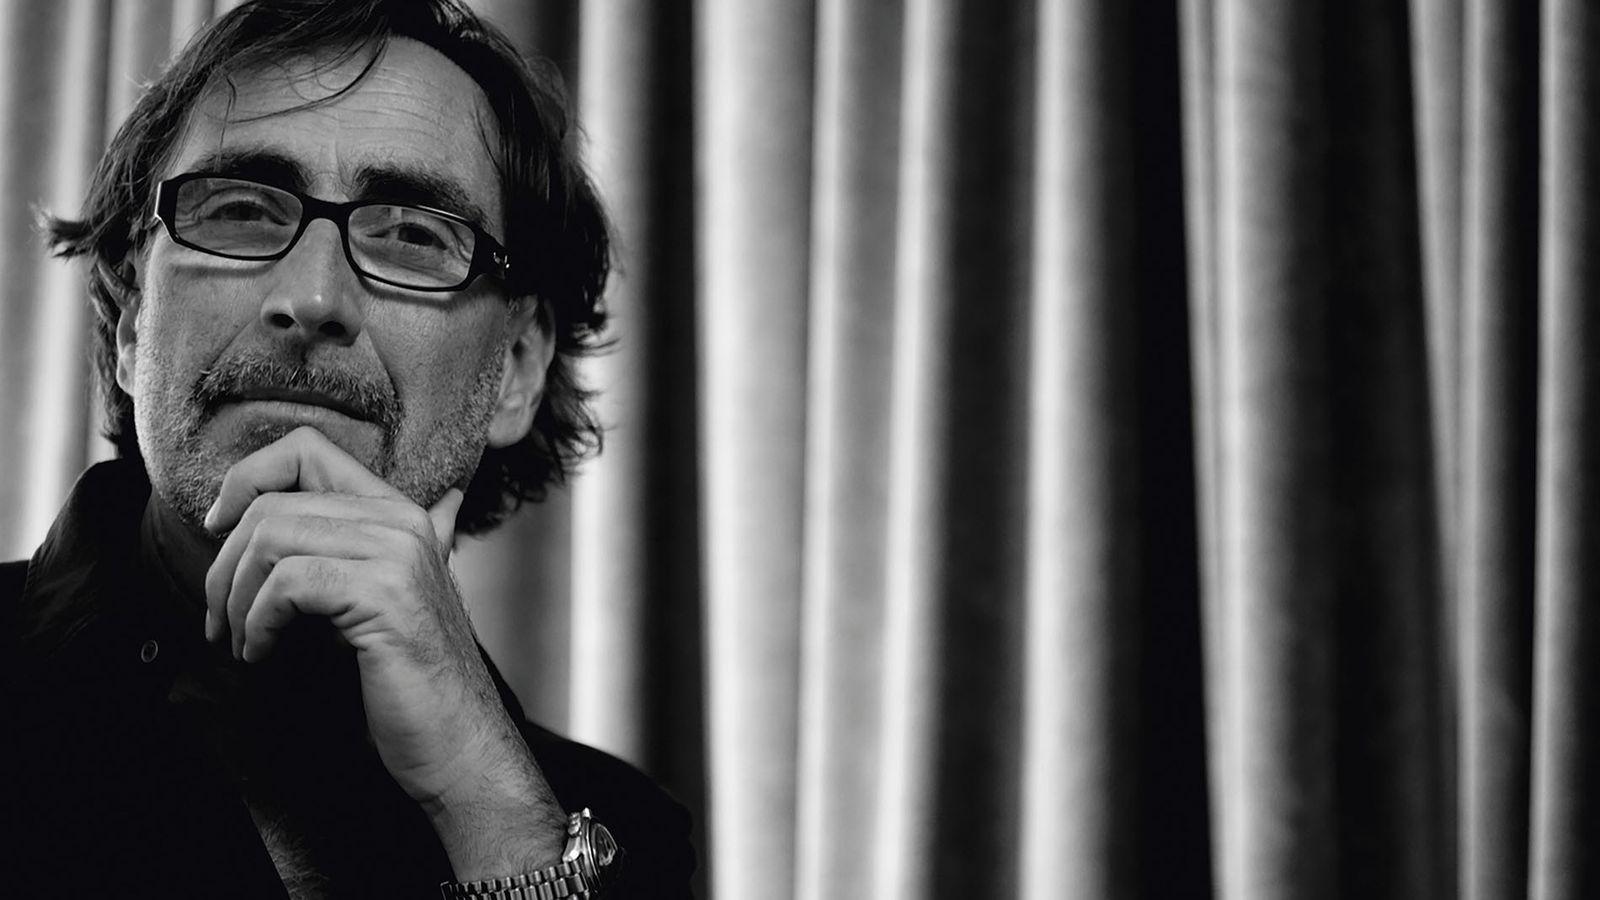 Architect Claudio Nardi